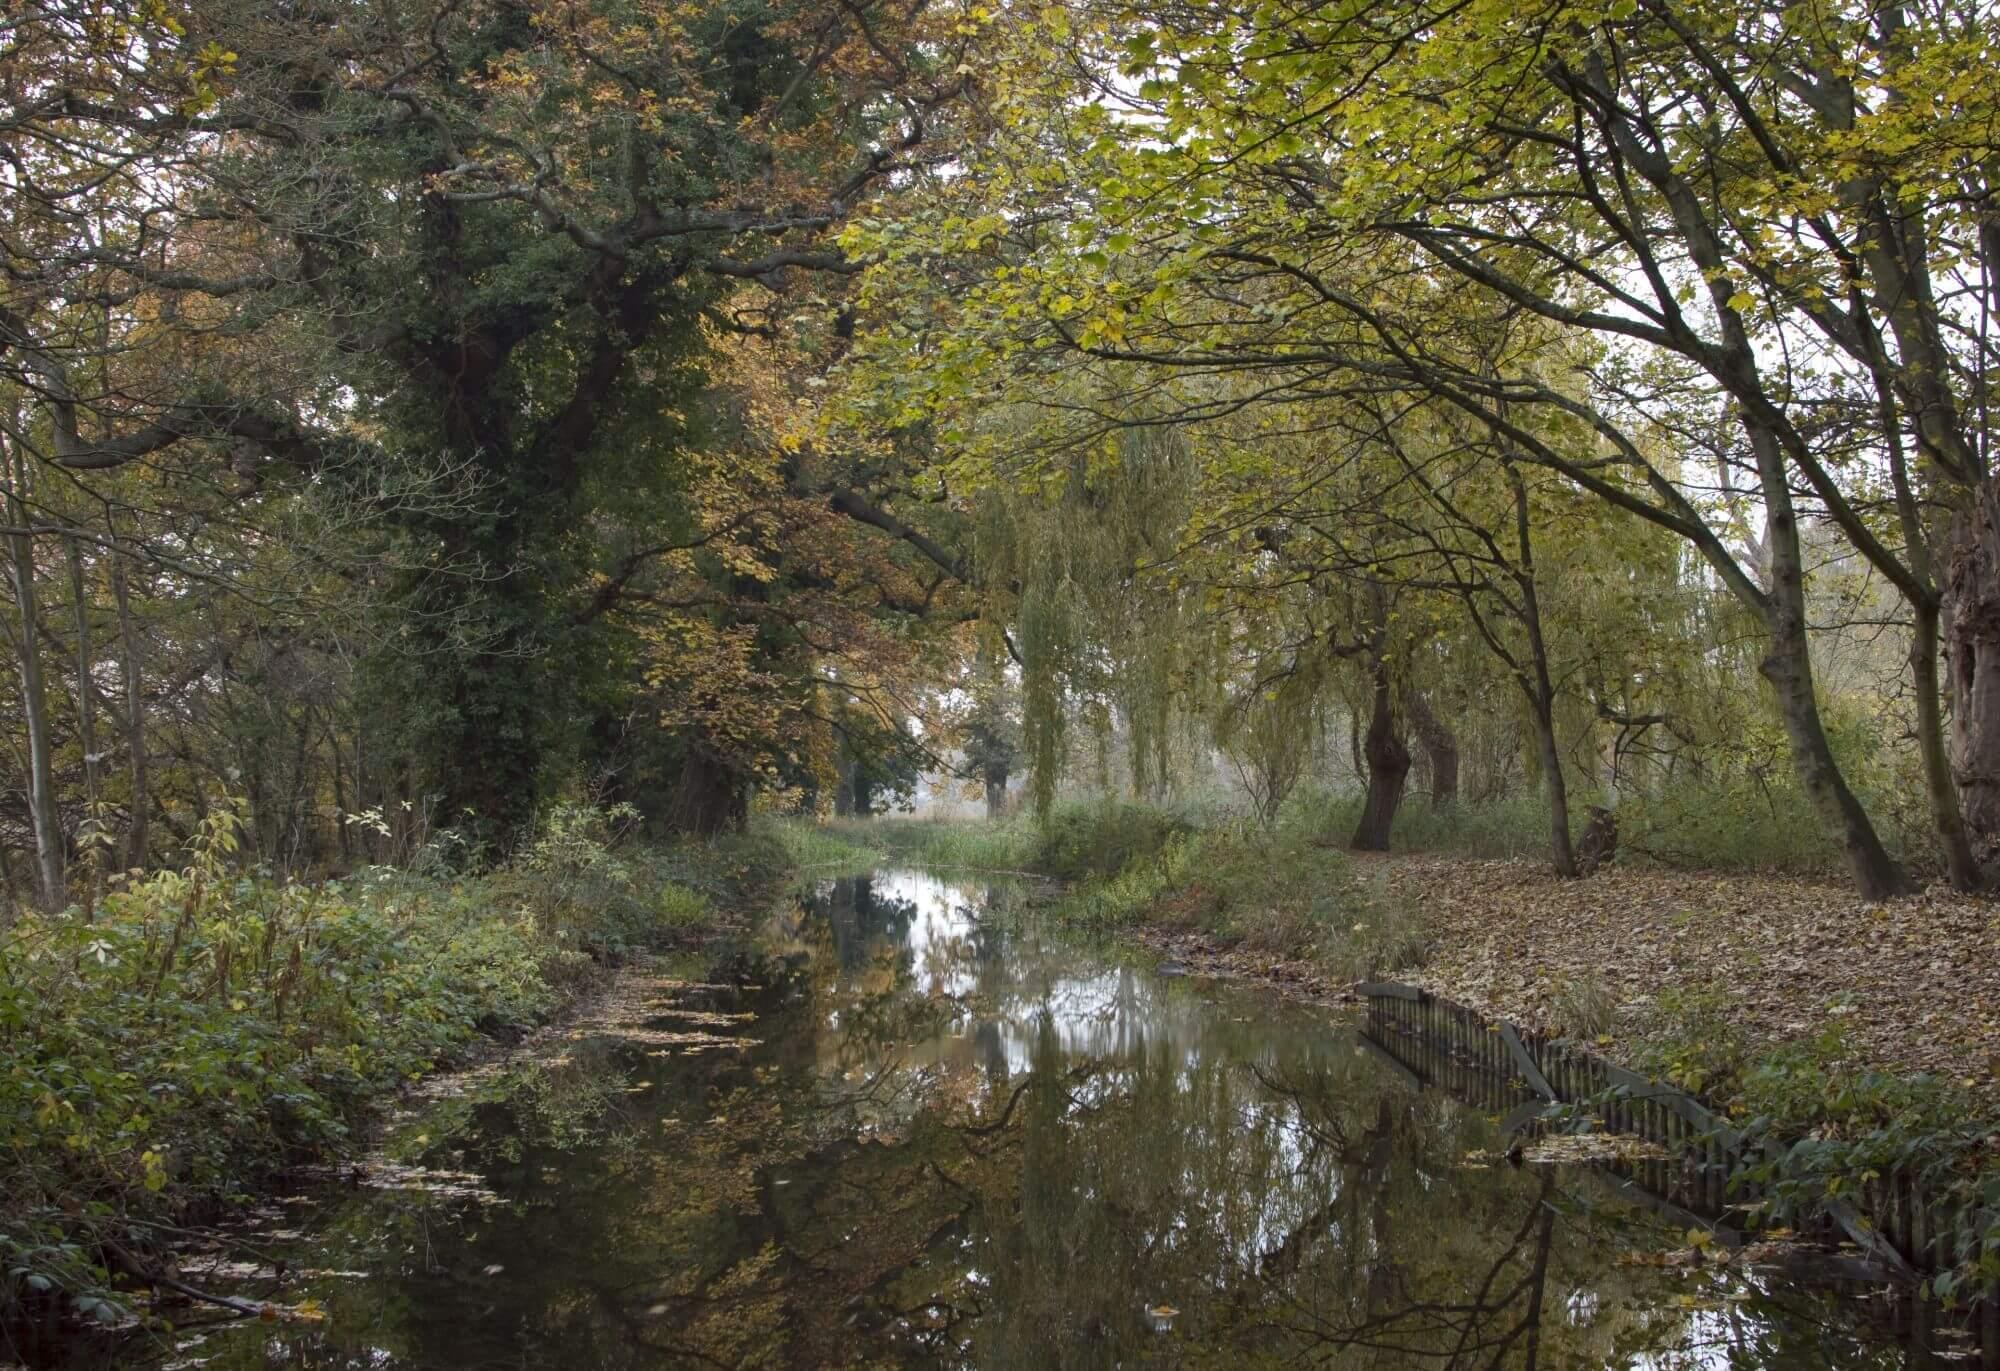 Autumn in the Woodland Gardens, Bushy Park.